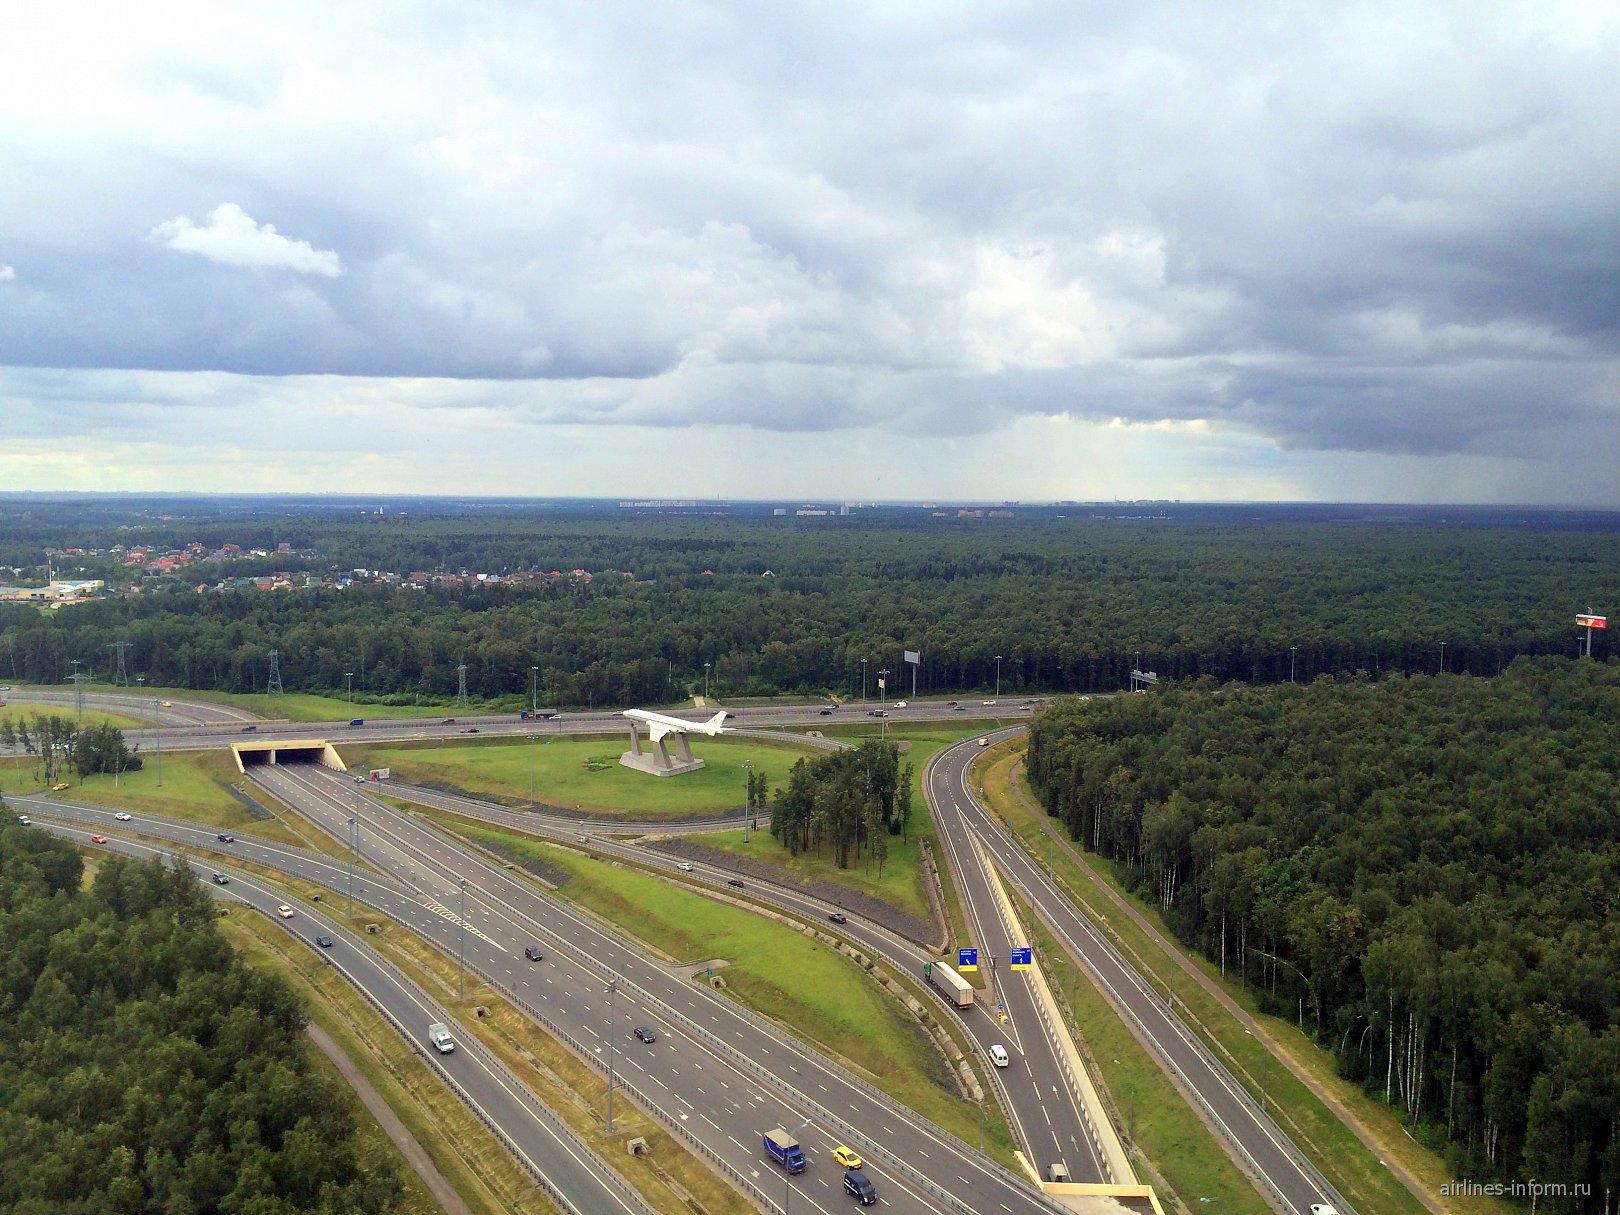 Съезд с Киевского шоссе на аэропорт Москва Внуково